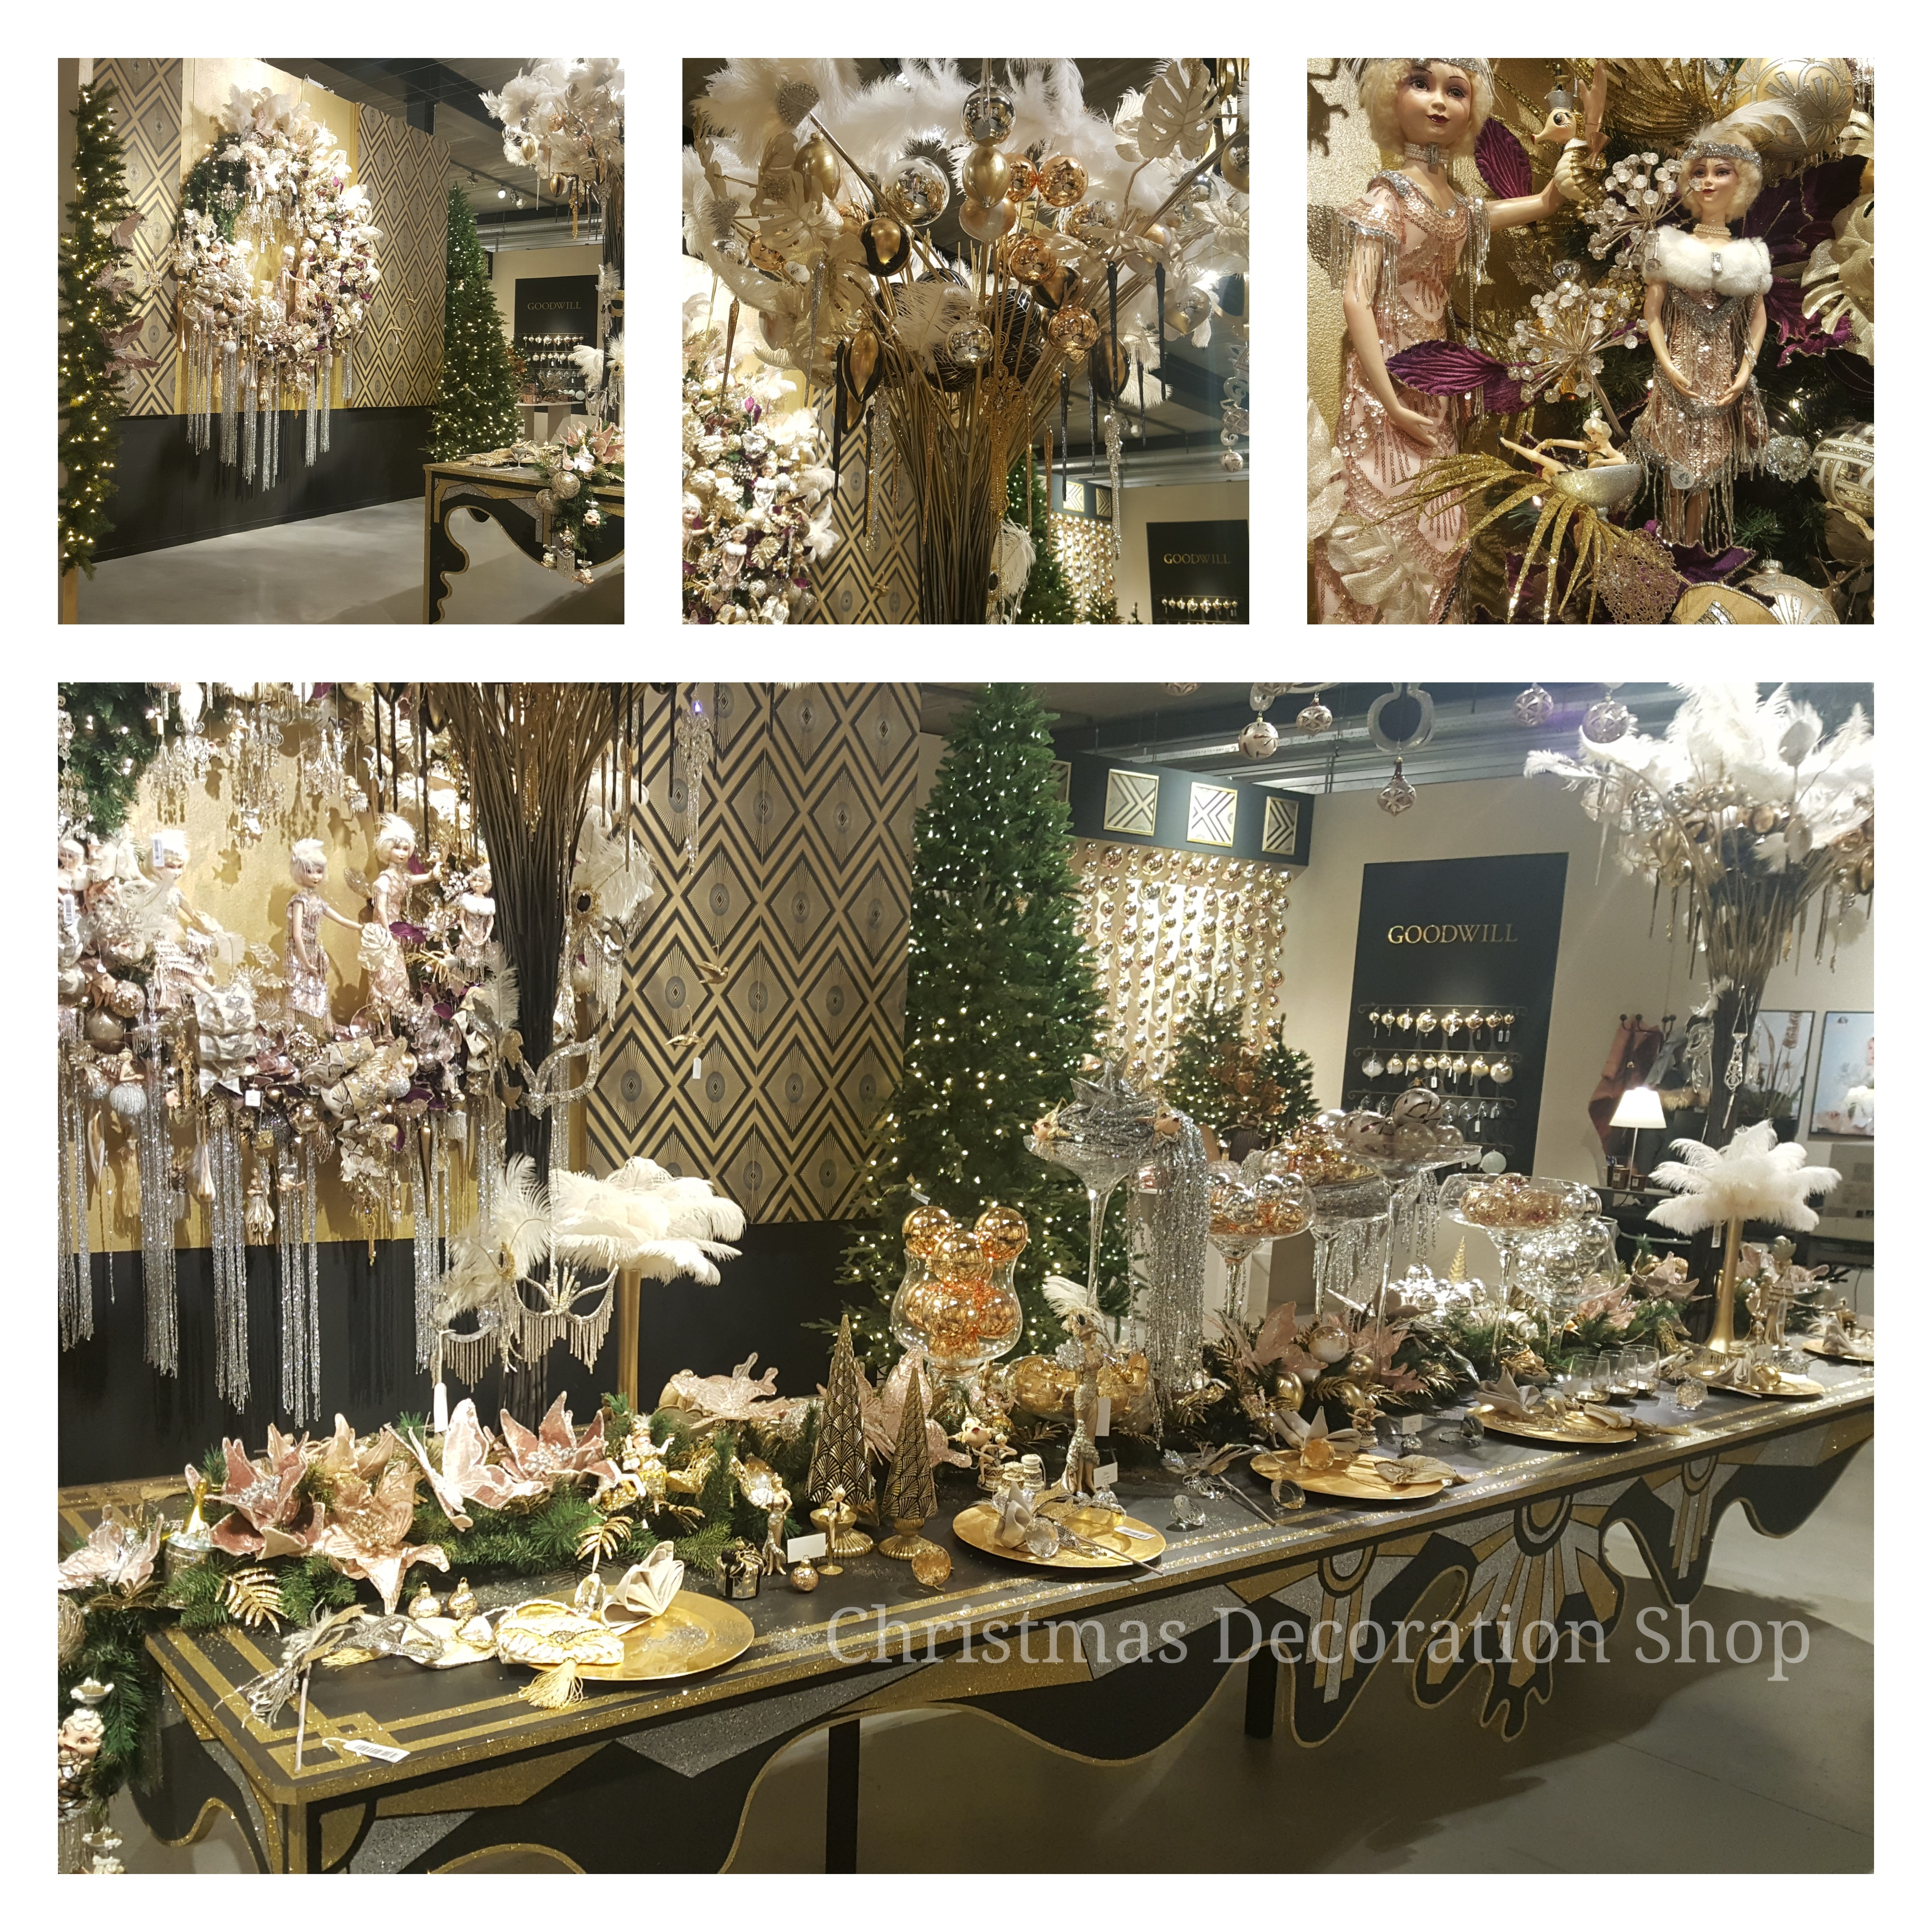 Decoration Shop Online: Christmas Season 2018 At Goodwill Showroom